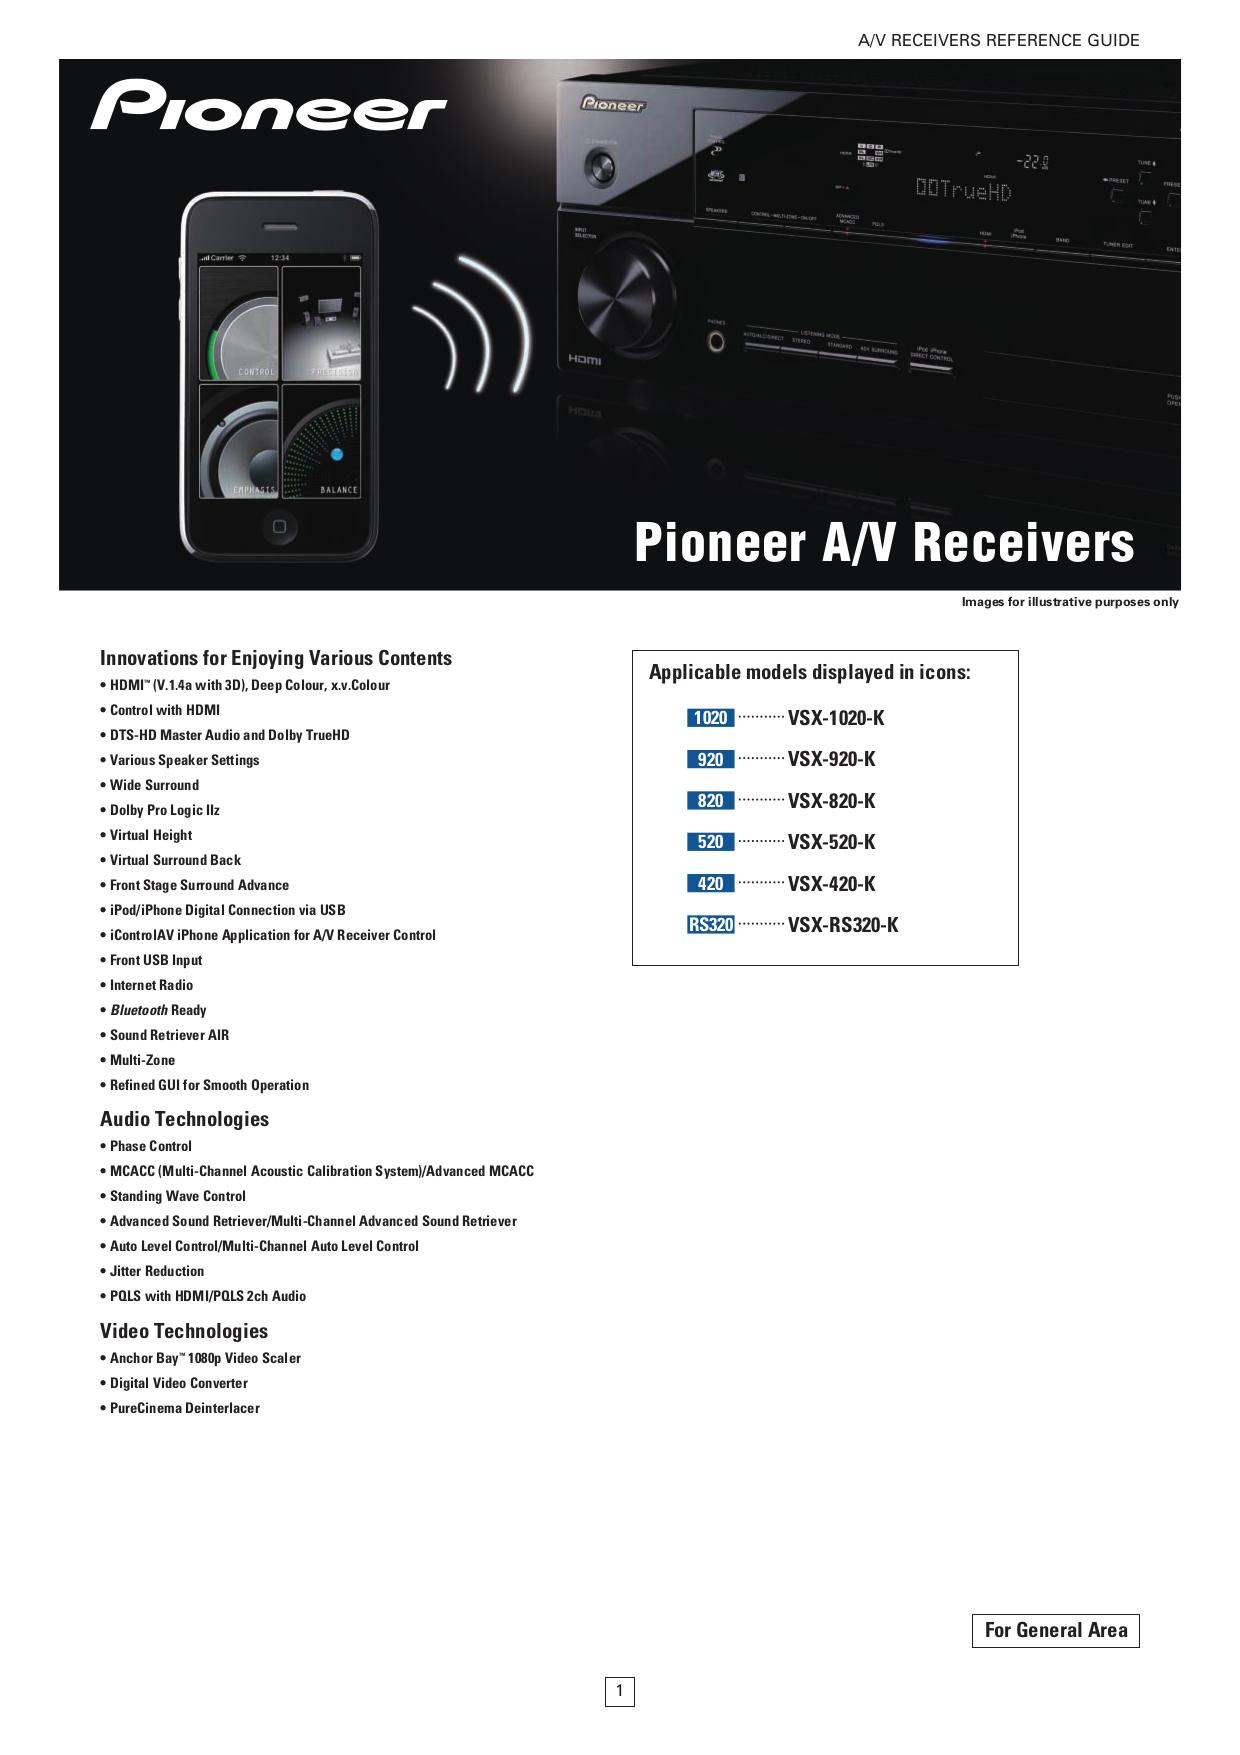 pioneer vsx 522 k manual pdf